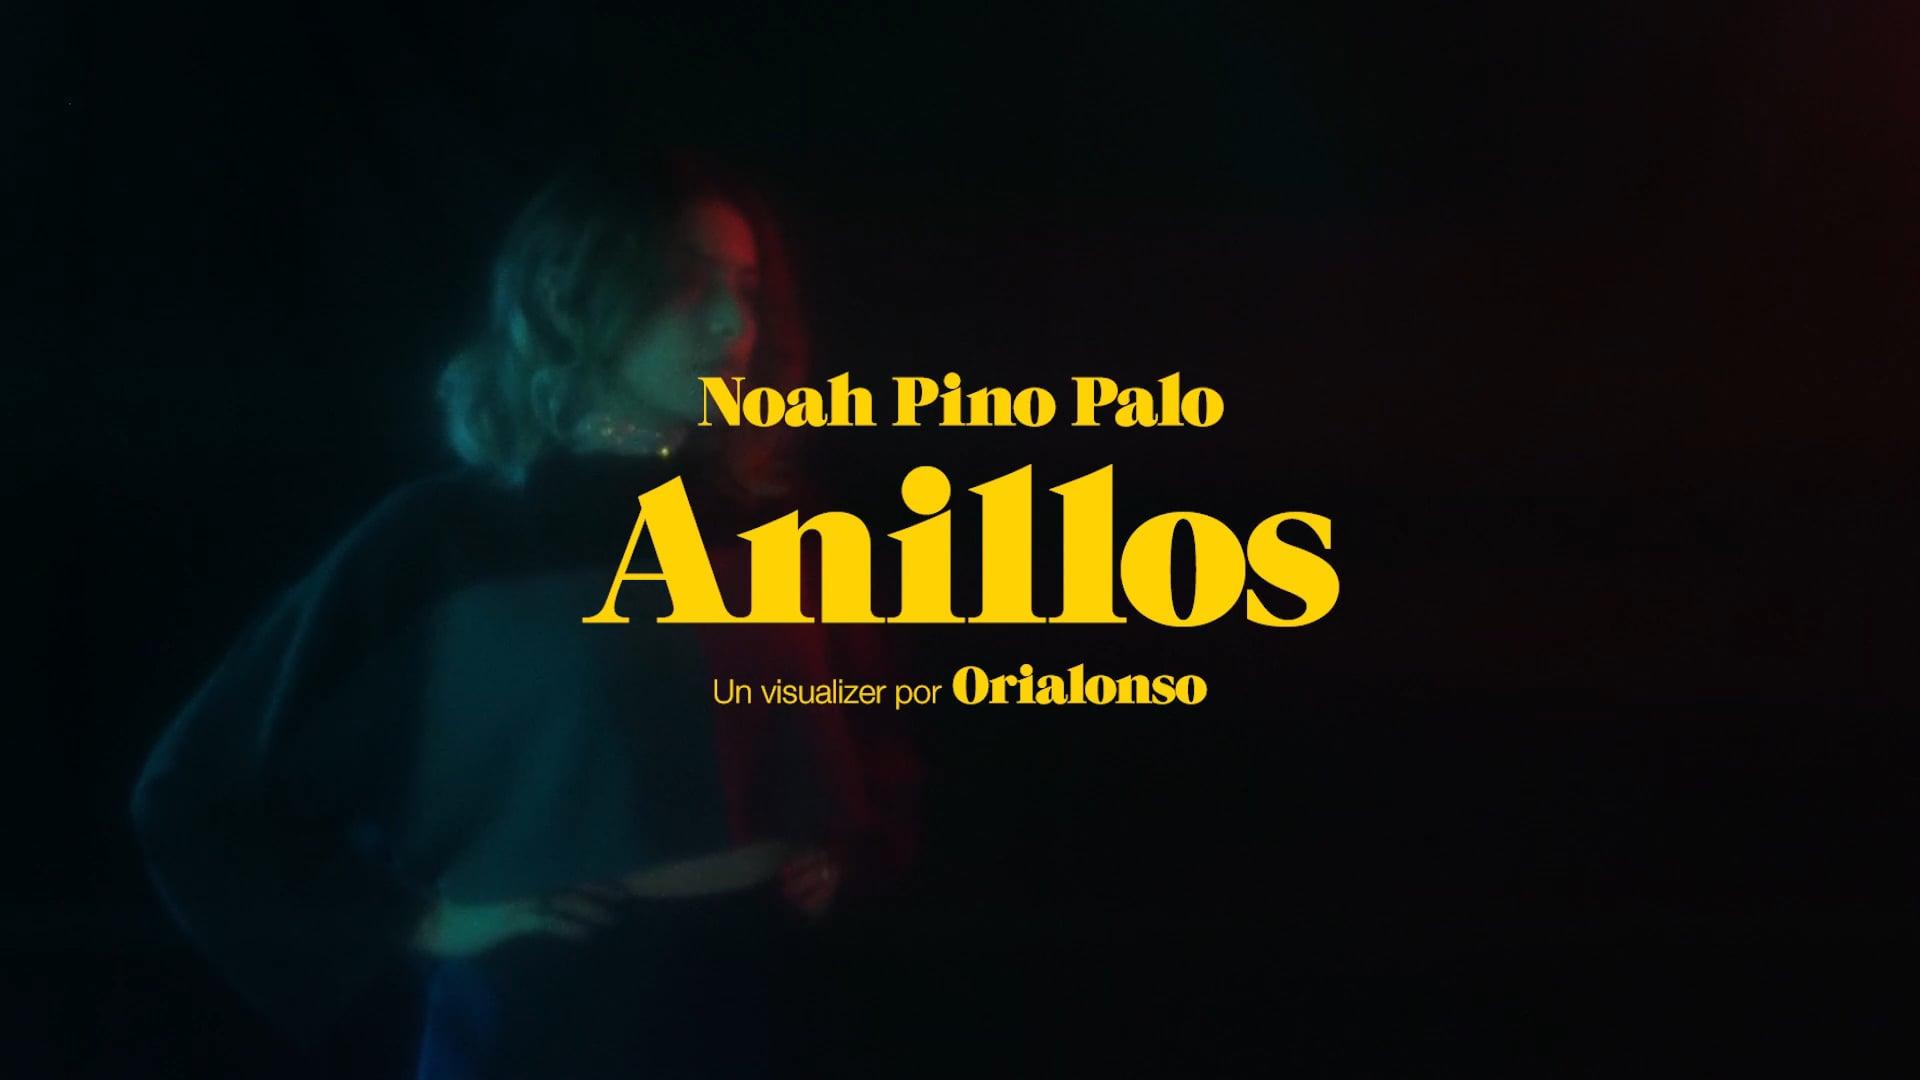 Anillos - Noah Pino Palo (Visualizer)